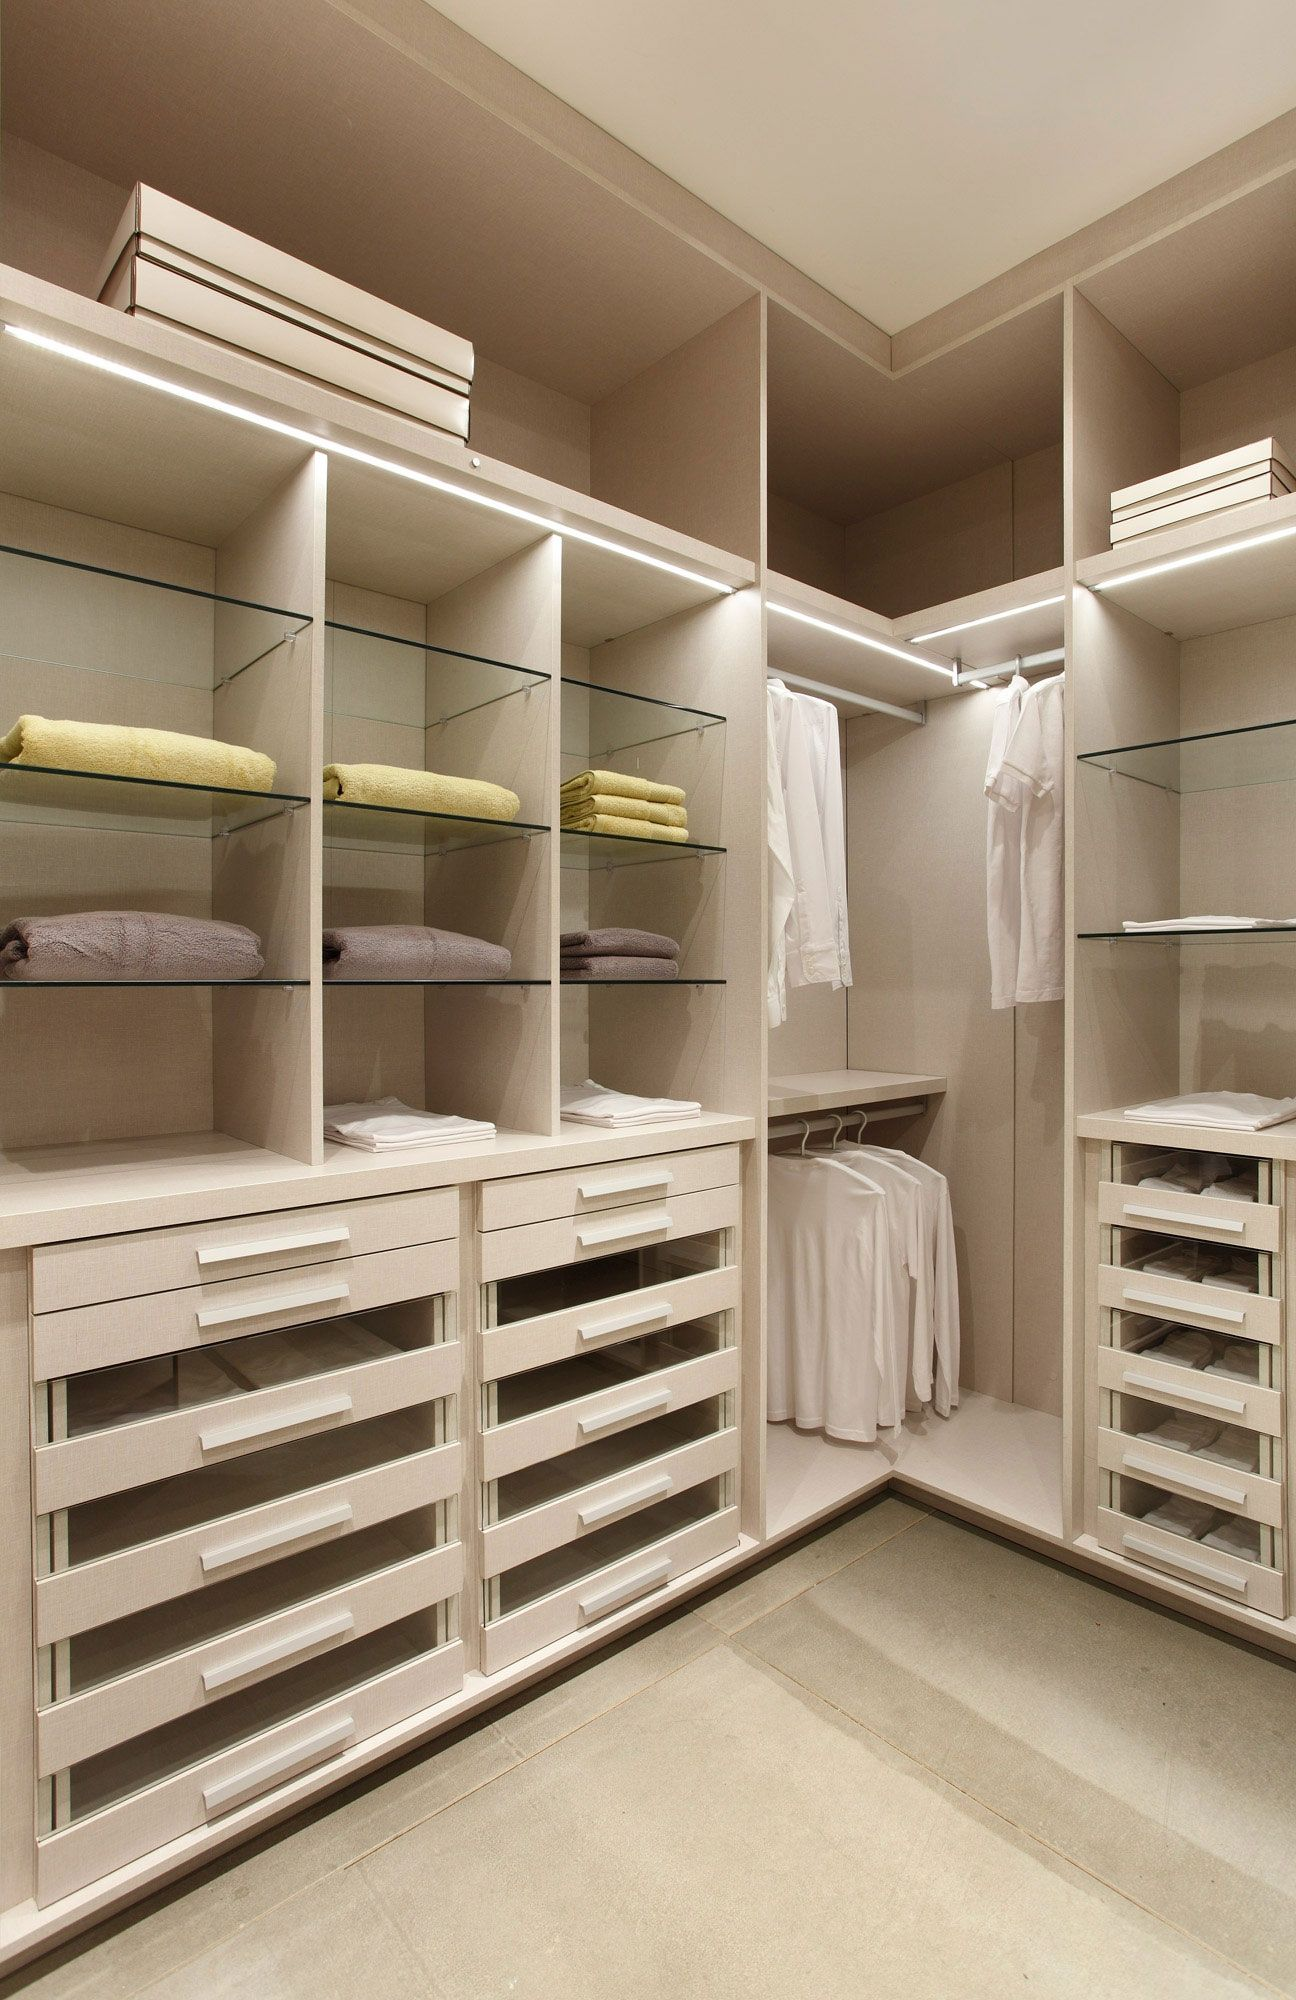 Closet Design Ideas Cupboards Cabinets Wardrobes Locker Room Makeover Interior